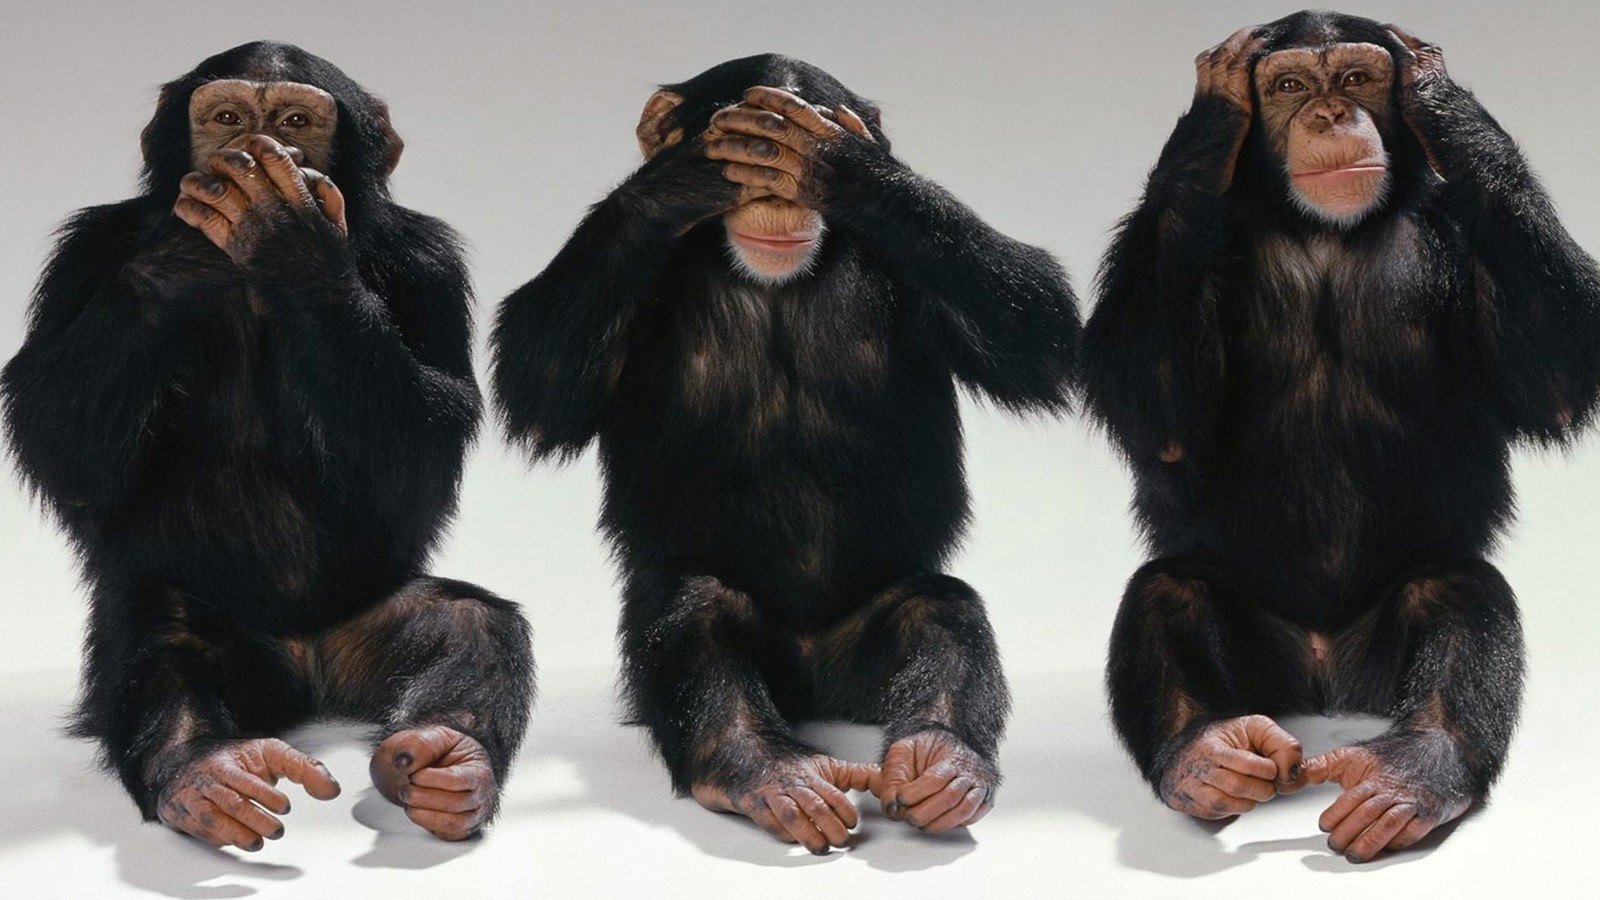 three-wise-monkeys.jpg